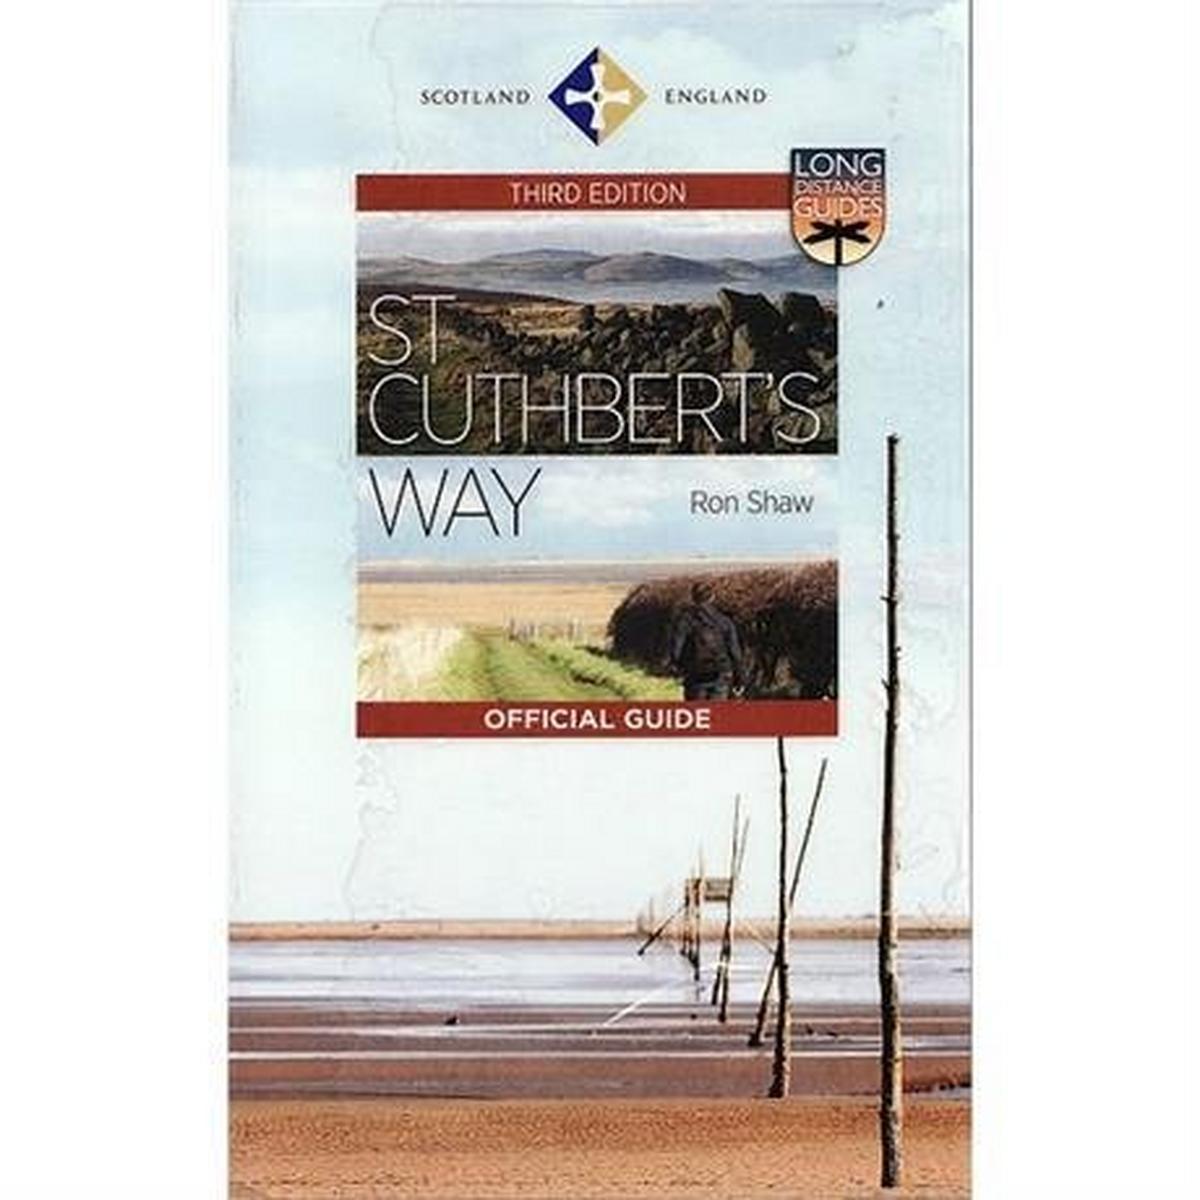 Miscellaneous Walking Guide Book: St. Cuthbert's Way